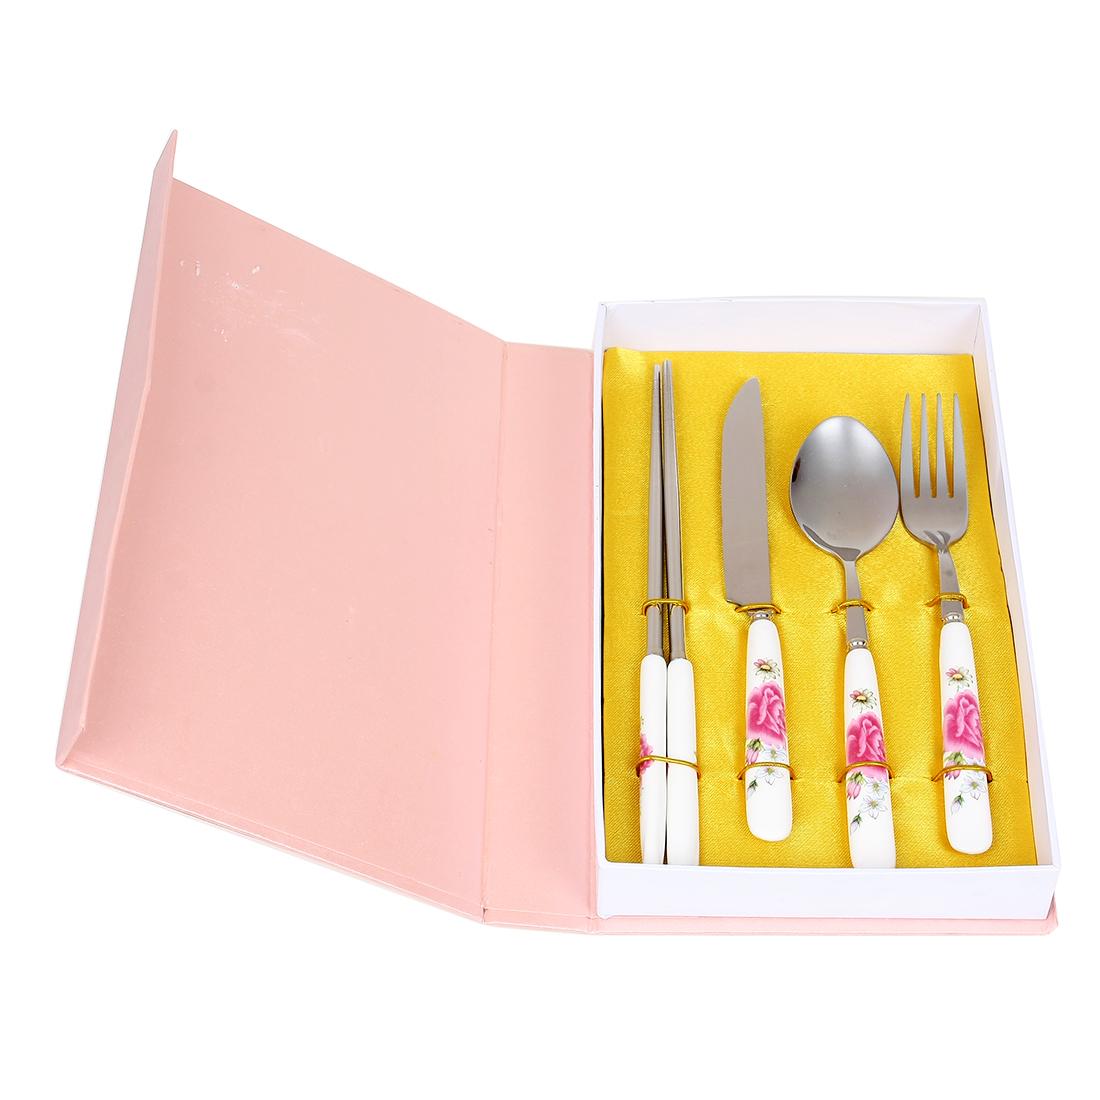 Casa-J Ceramic Handle Flower Print Spoon Fork Chopsticks Cutlery Set 4 in 1